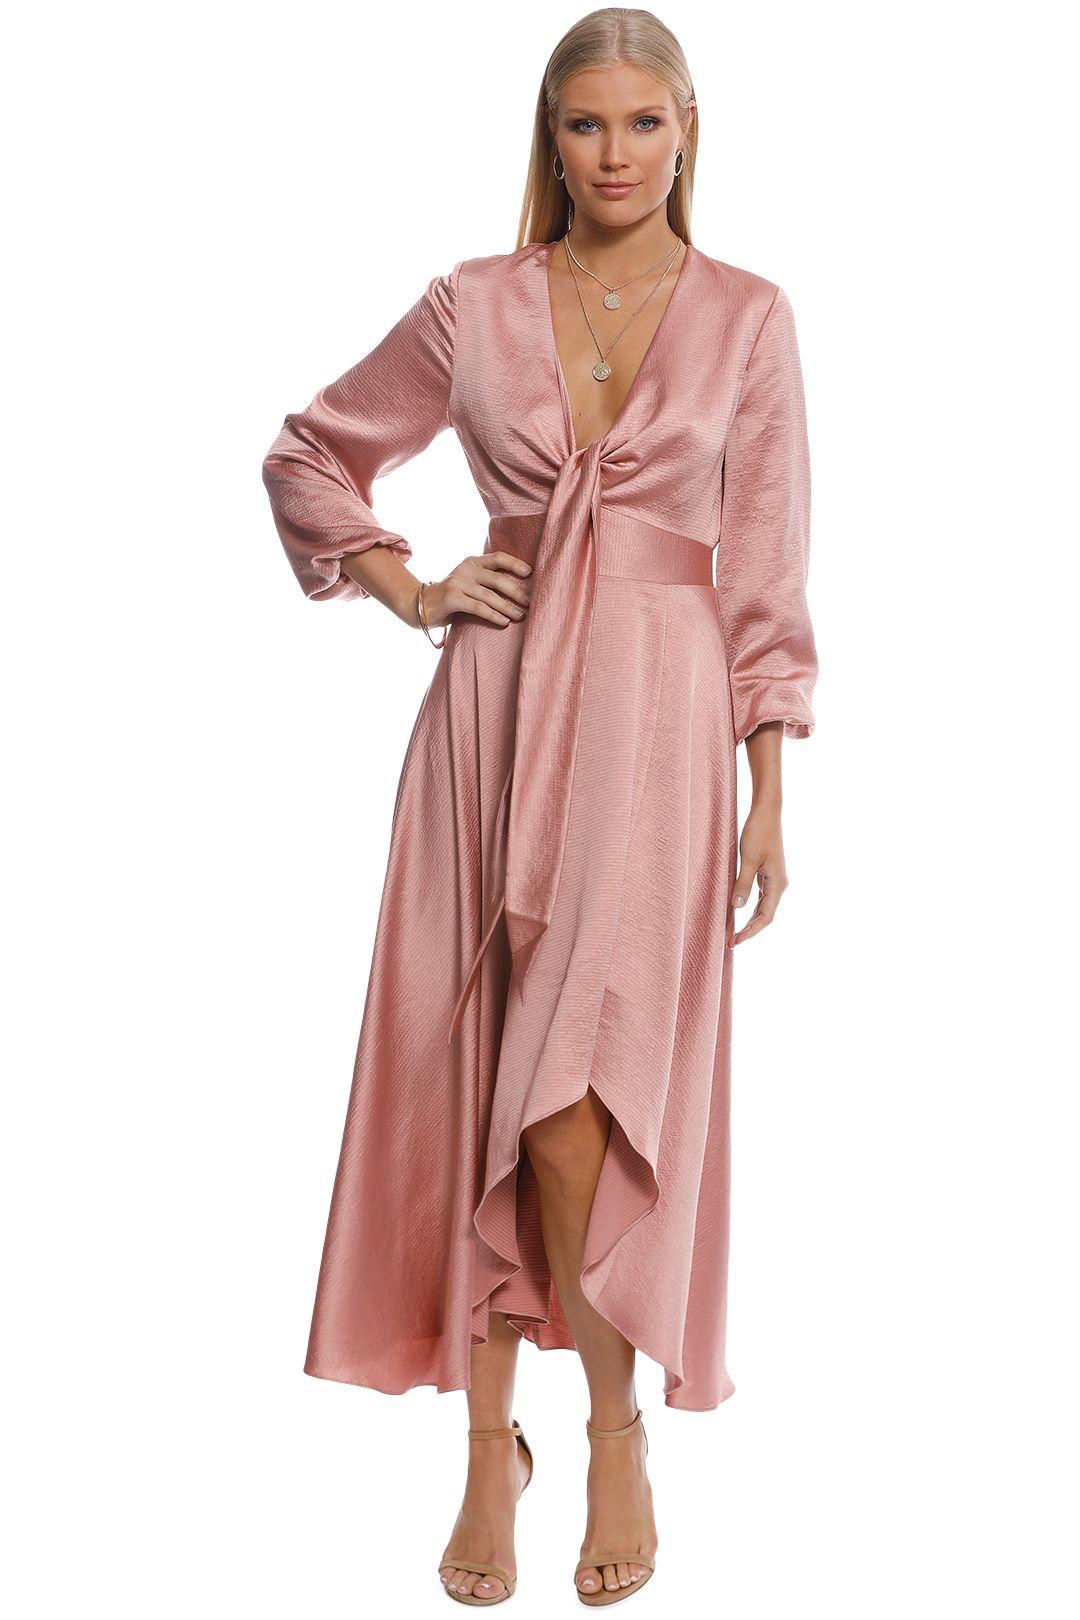 Pasduchas - Mercury Midi Dress - Blush - Front